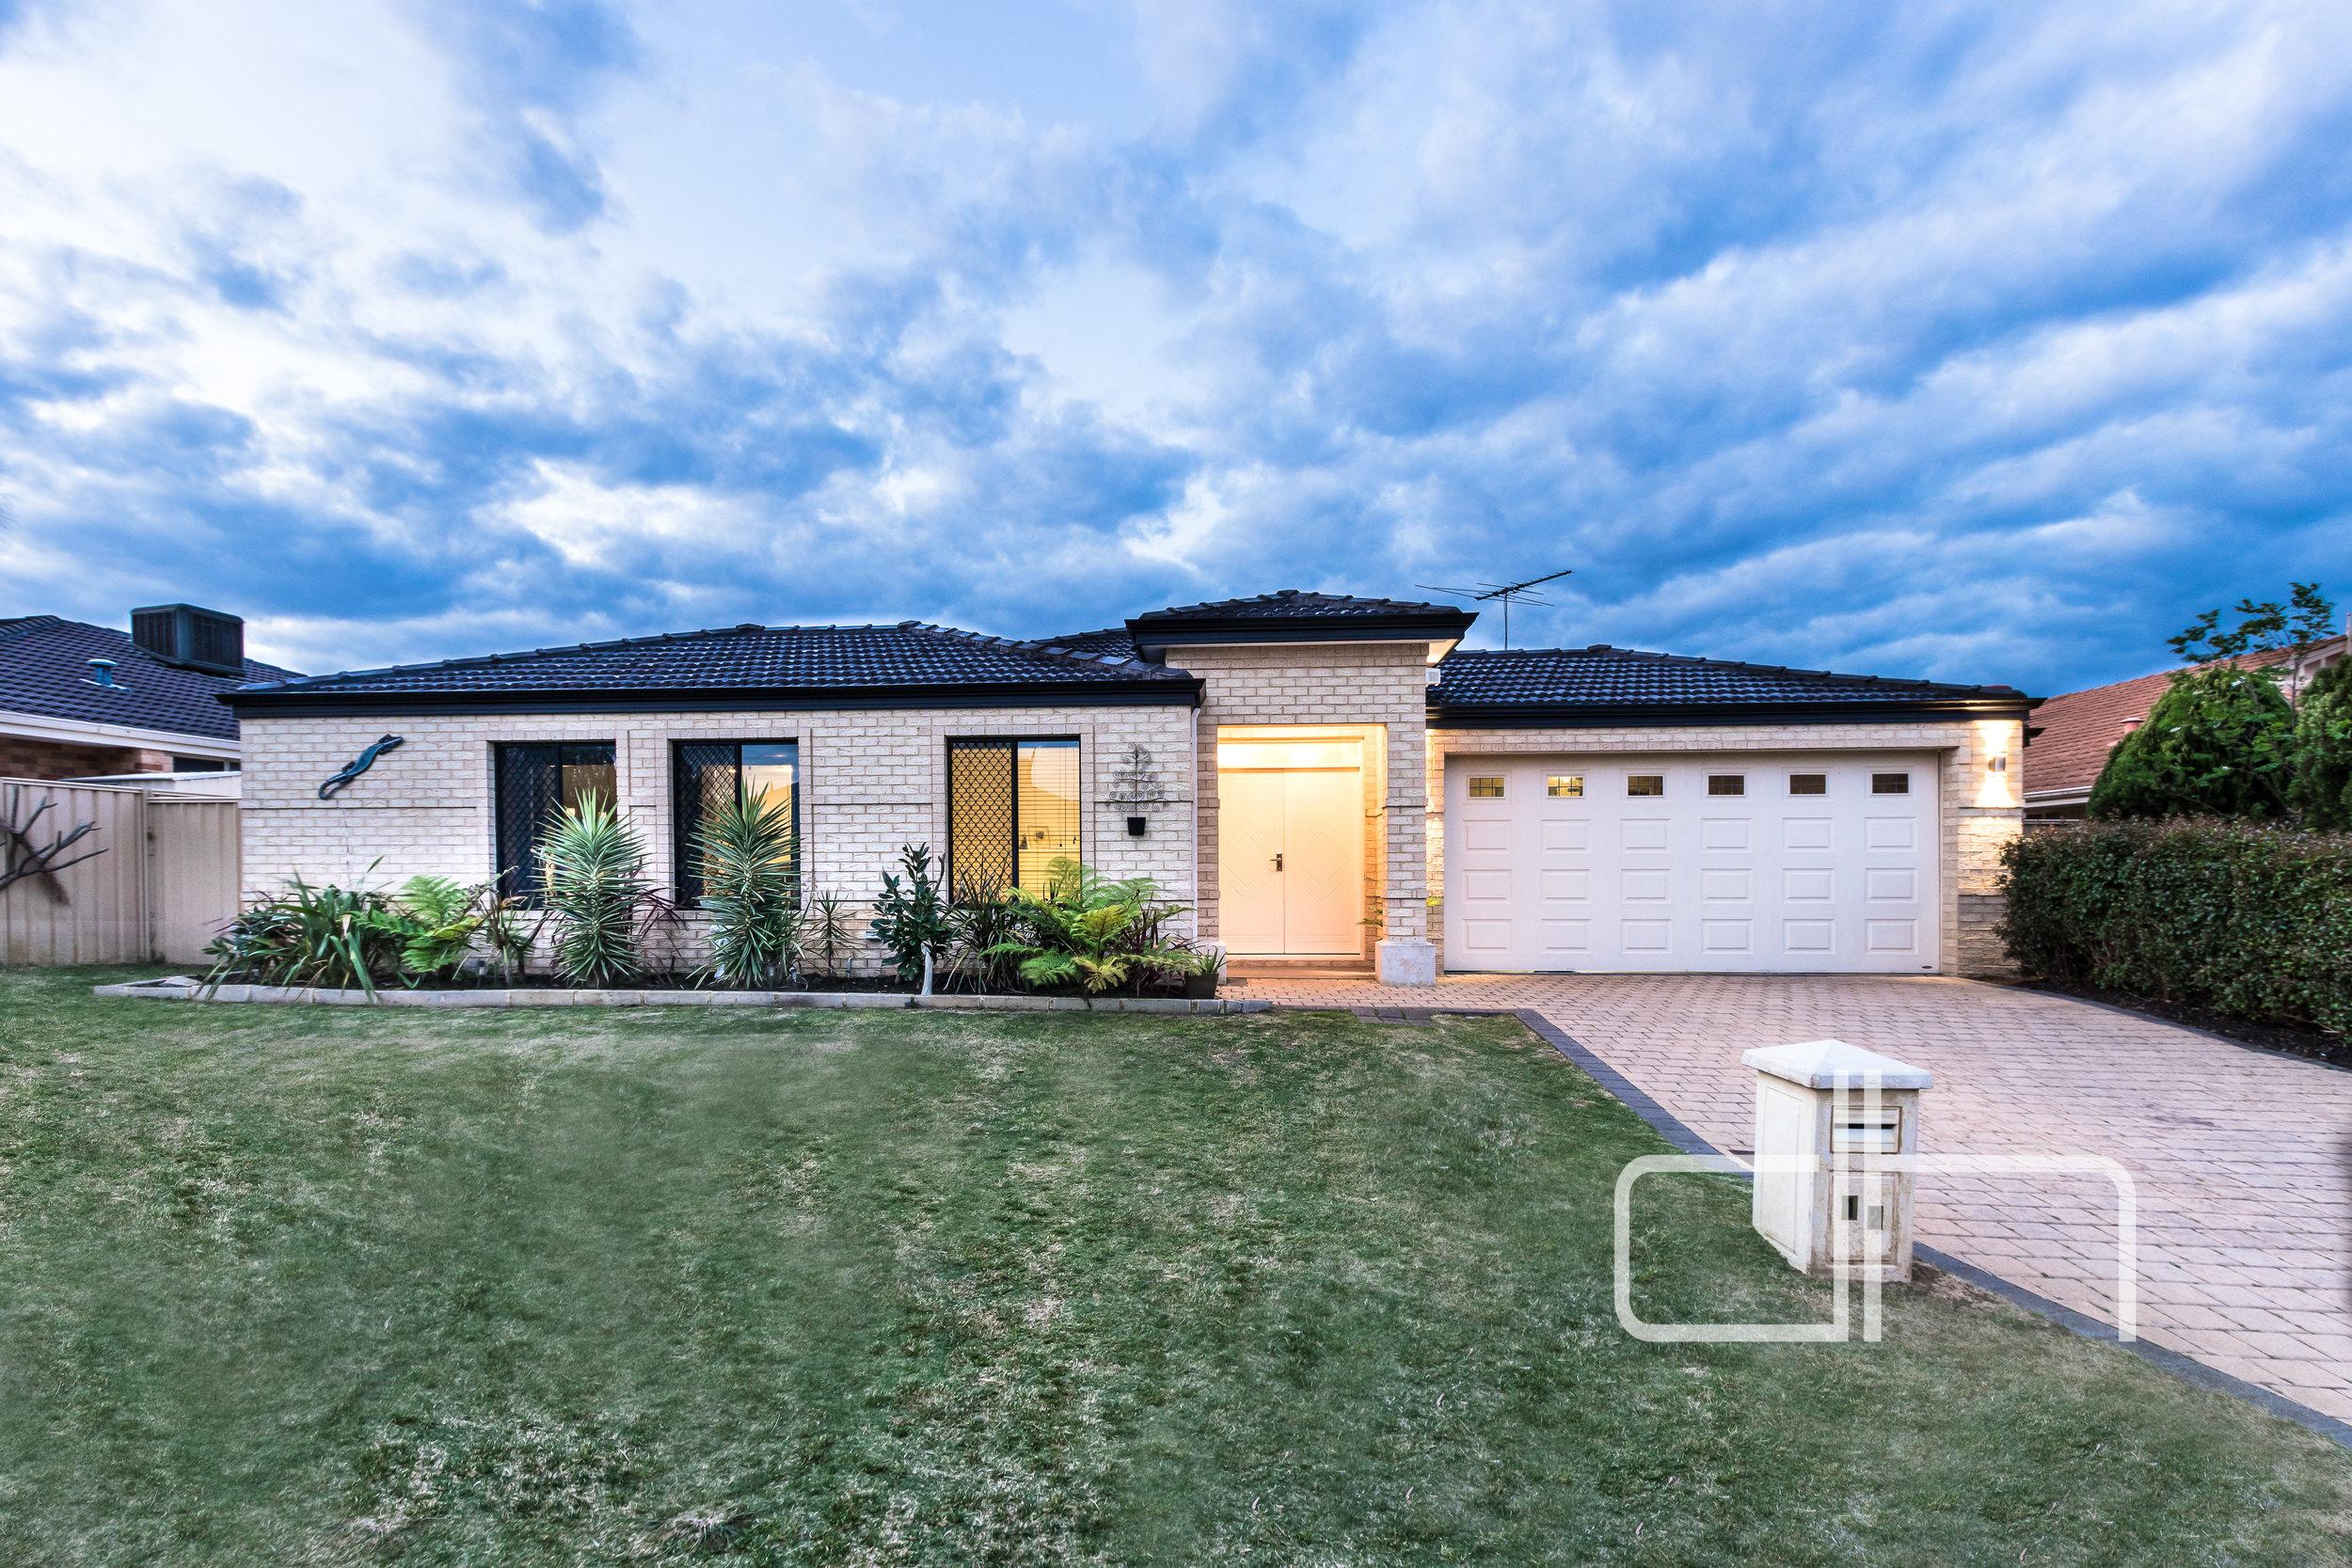 12 Raeburn Crescent $545,000